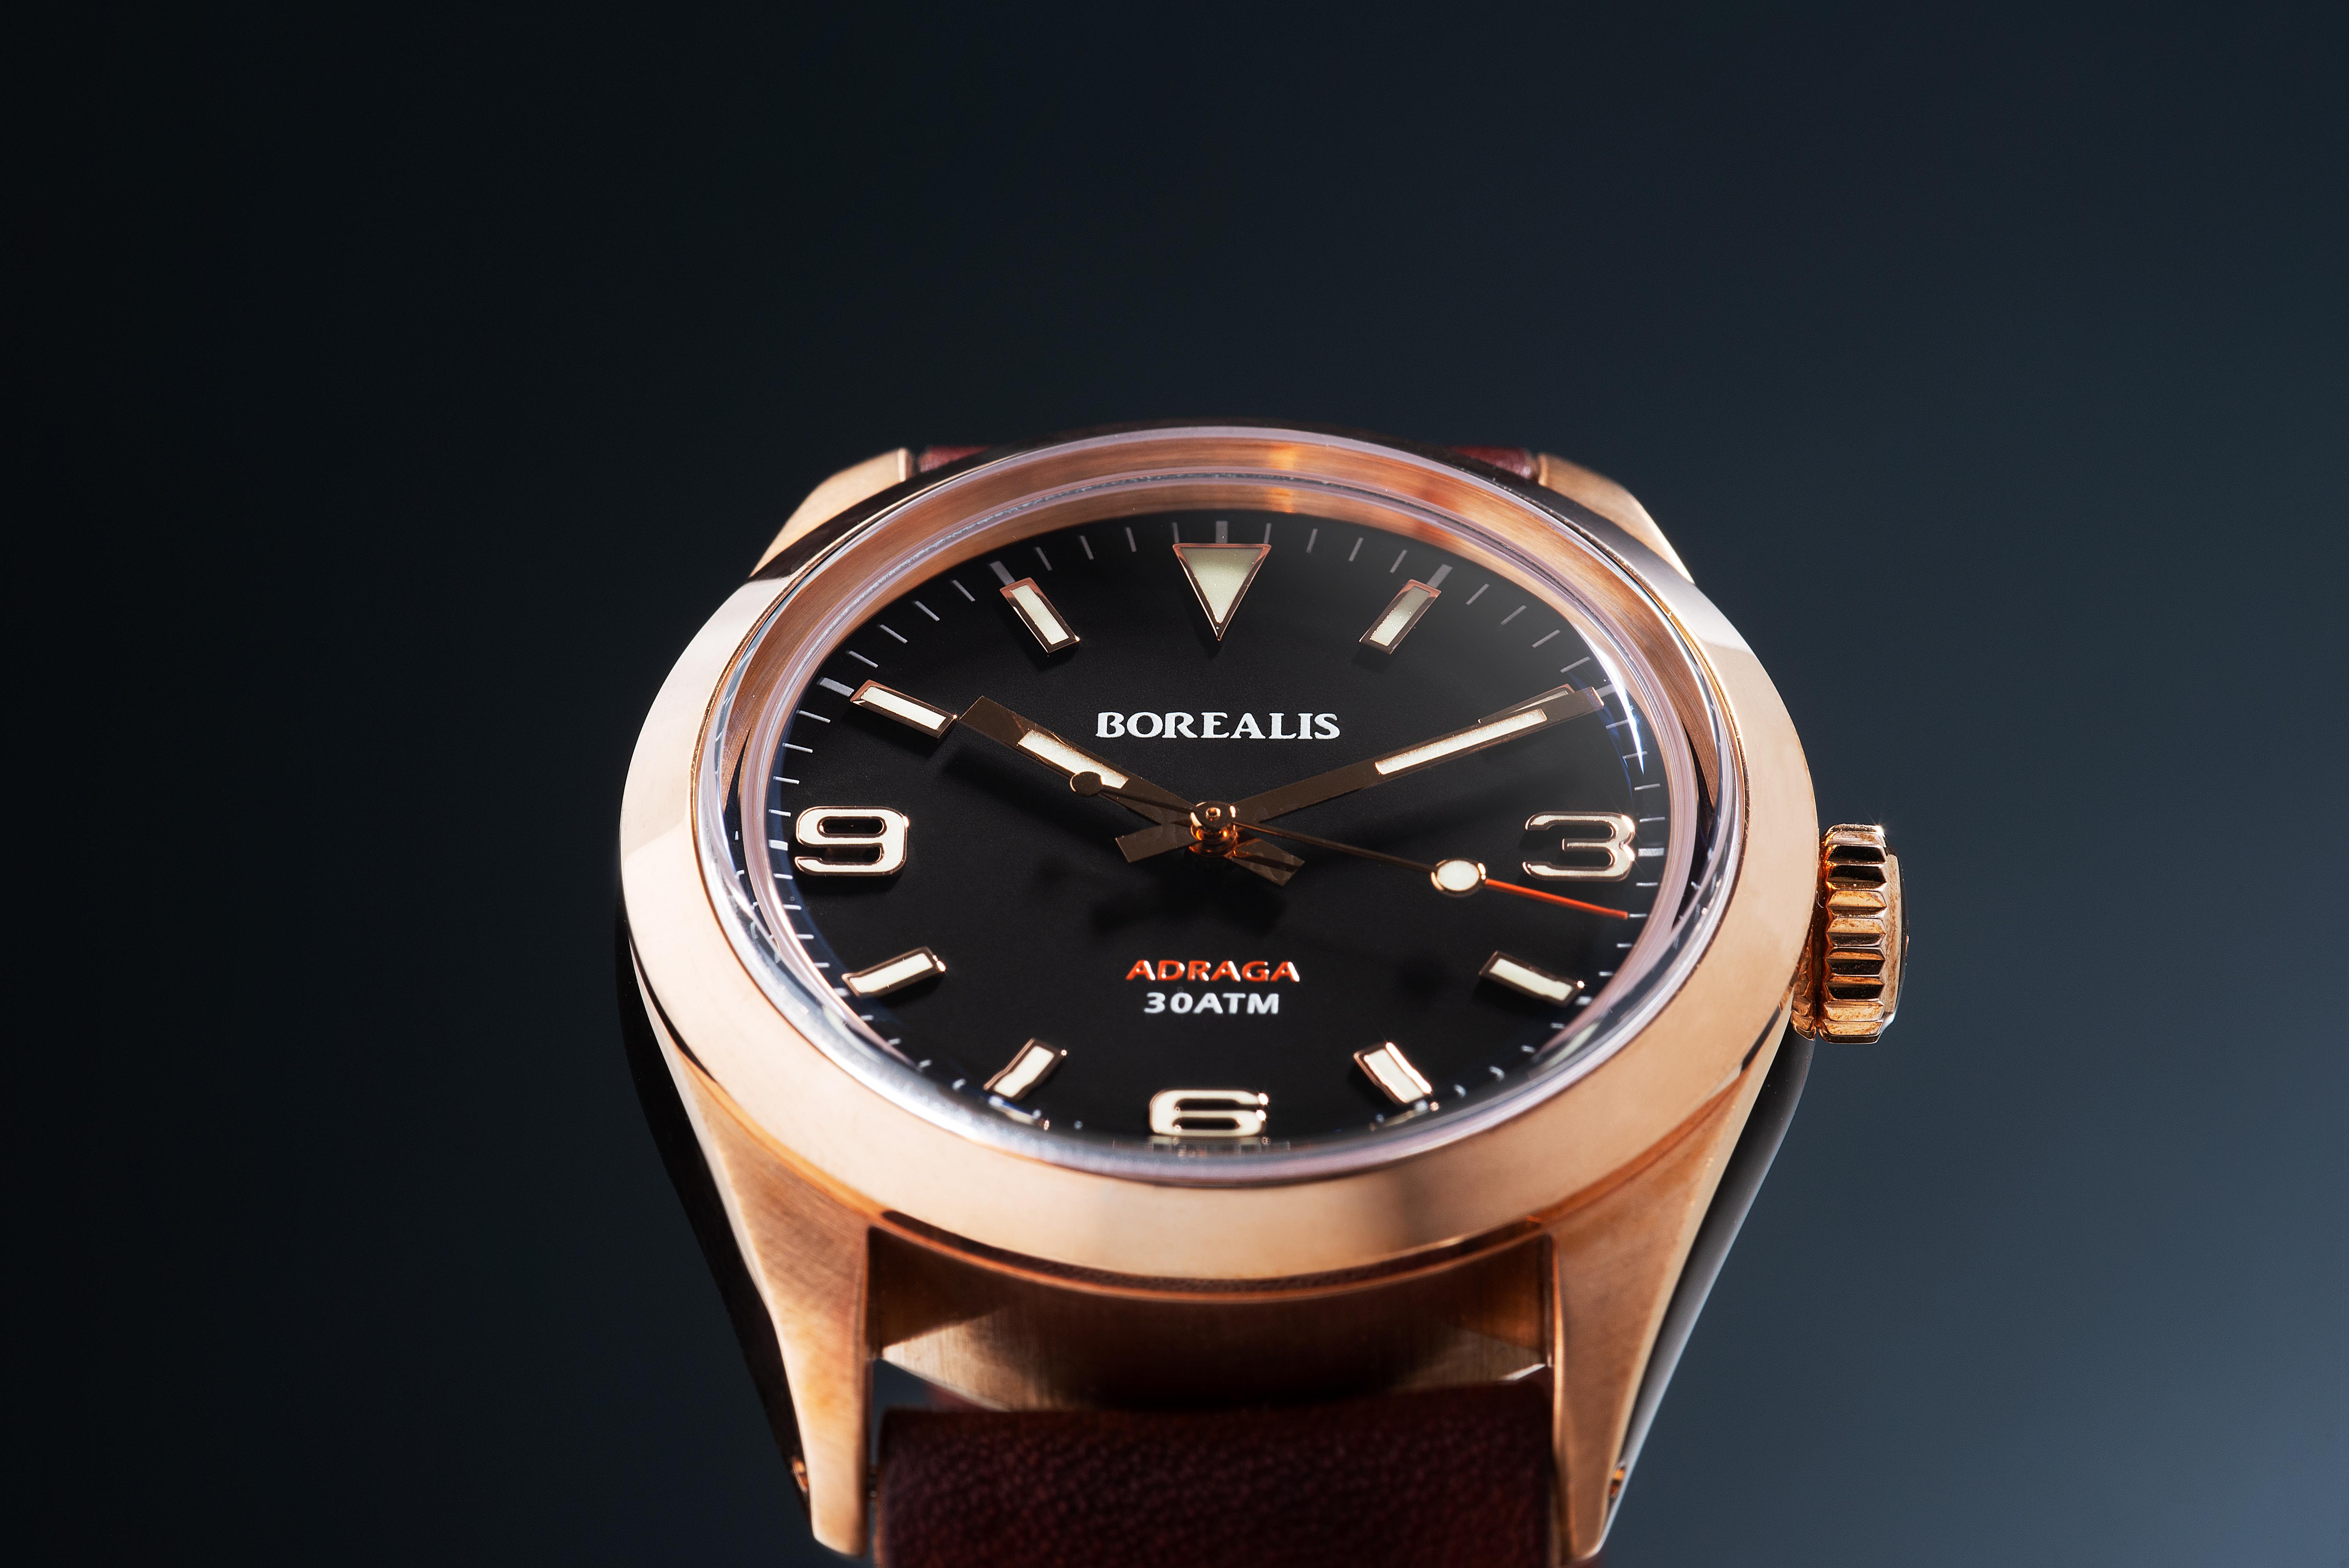 Borealis Adraga Bronze CuSn8 NH38 movement Type B C3X1 Lume